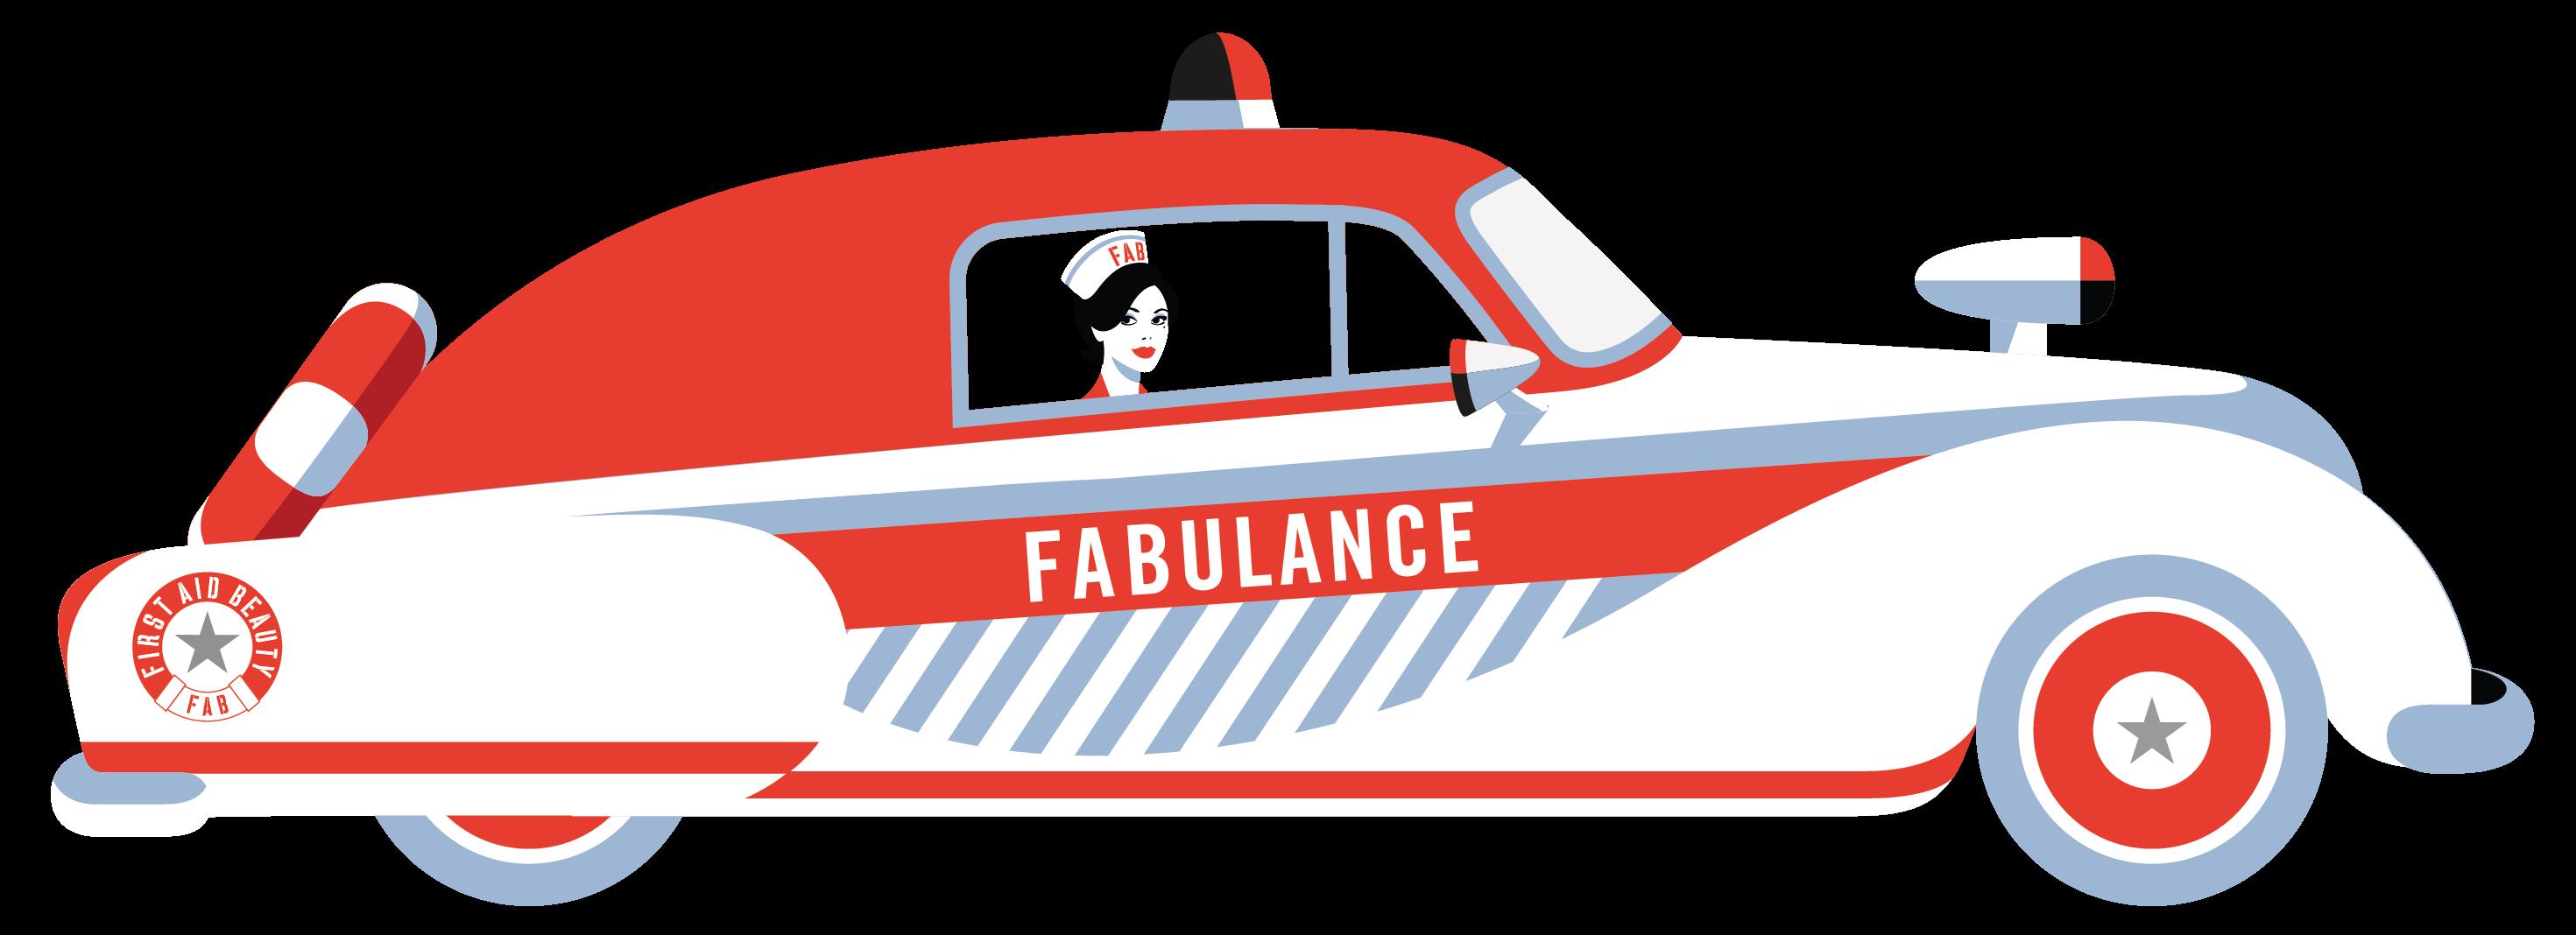 FAB Fabulance